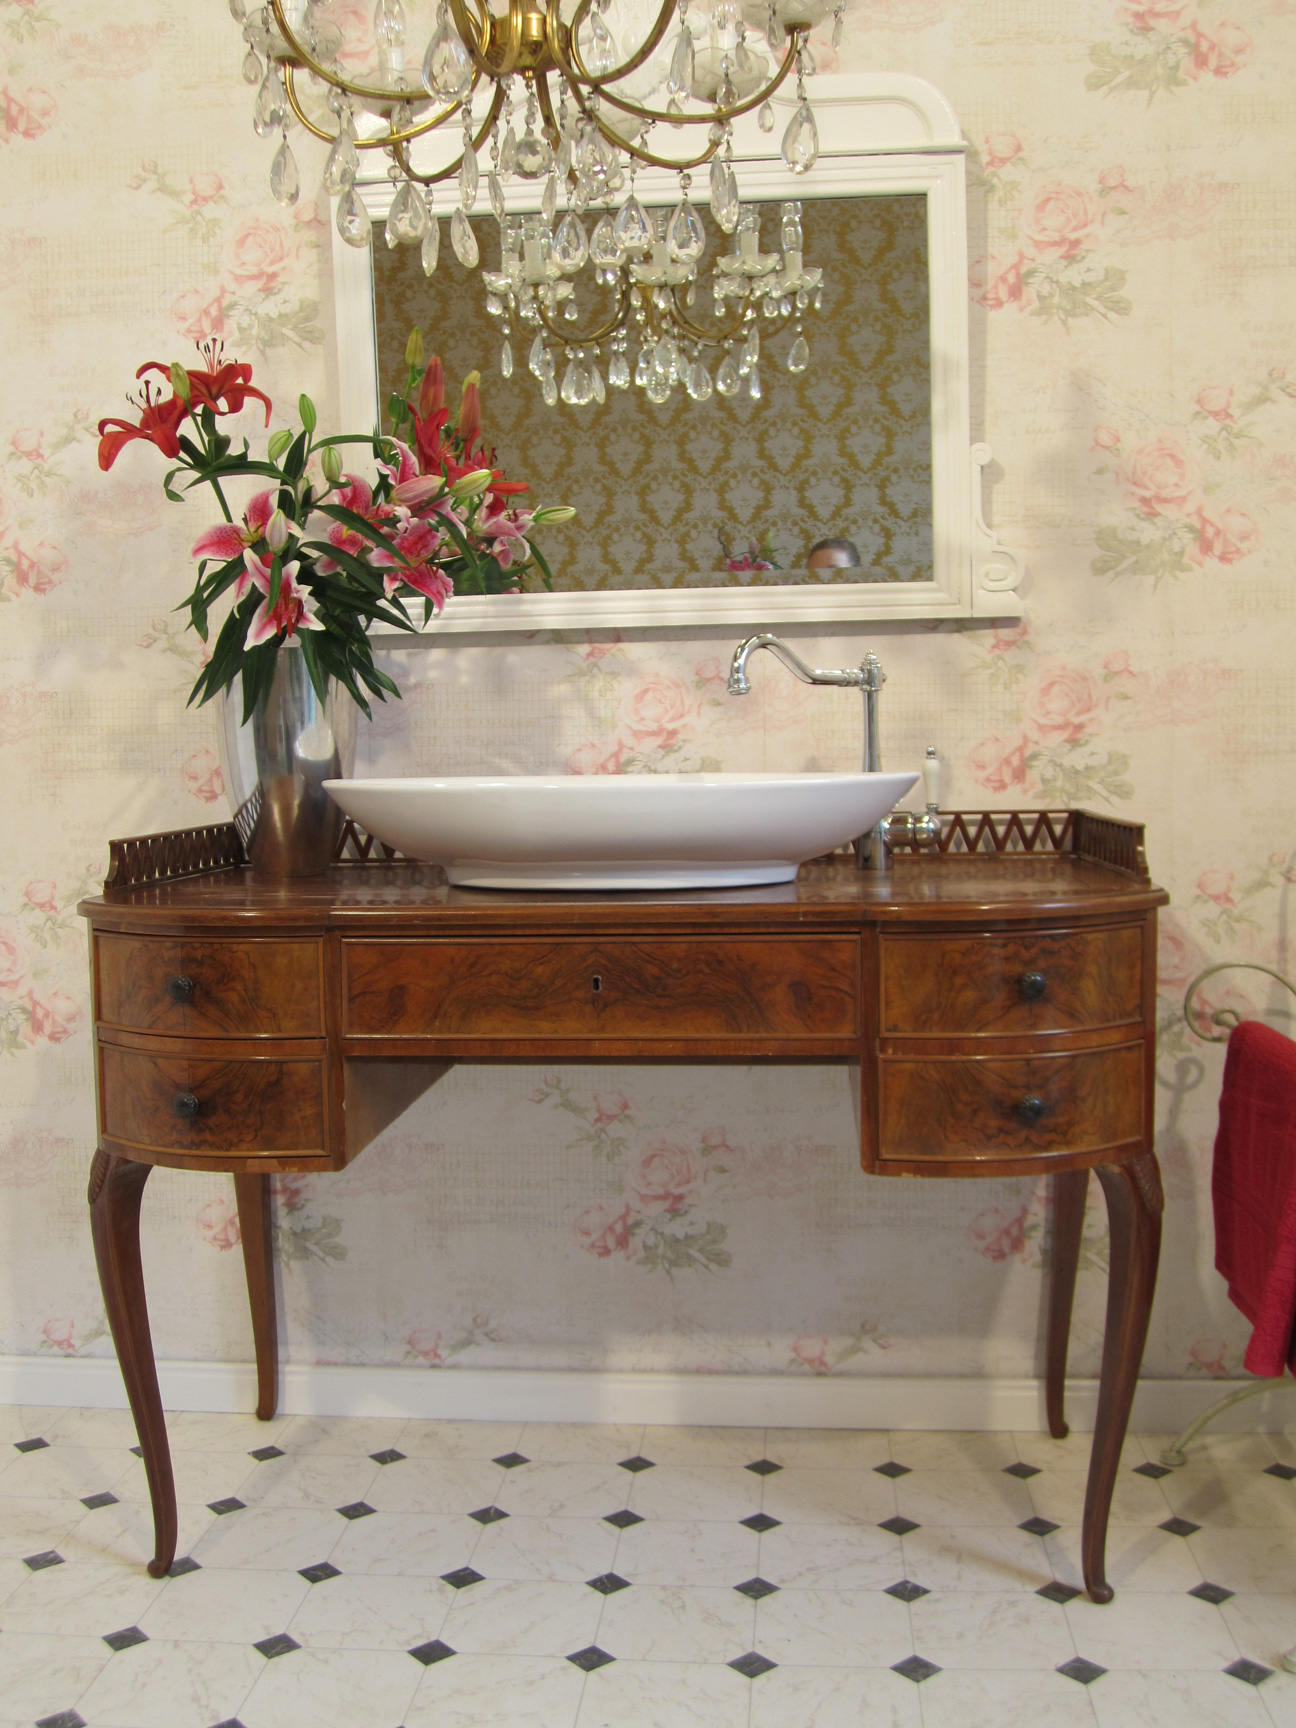 badezimmer englisch. Black Bedroom Furniture Sets. Home Design Ideas